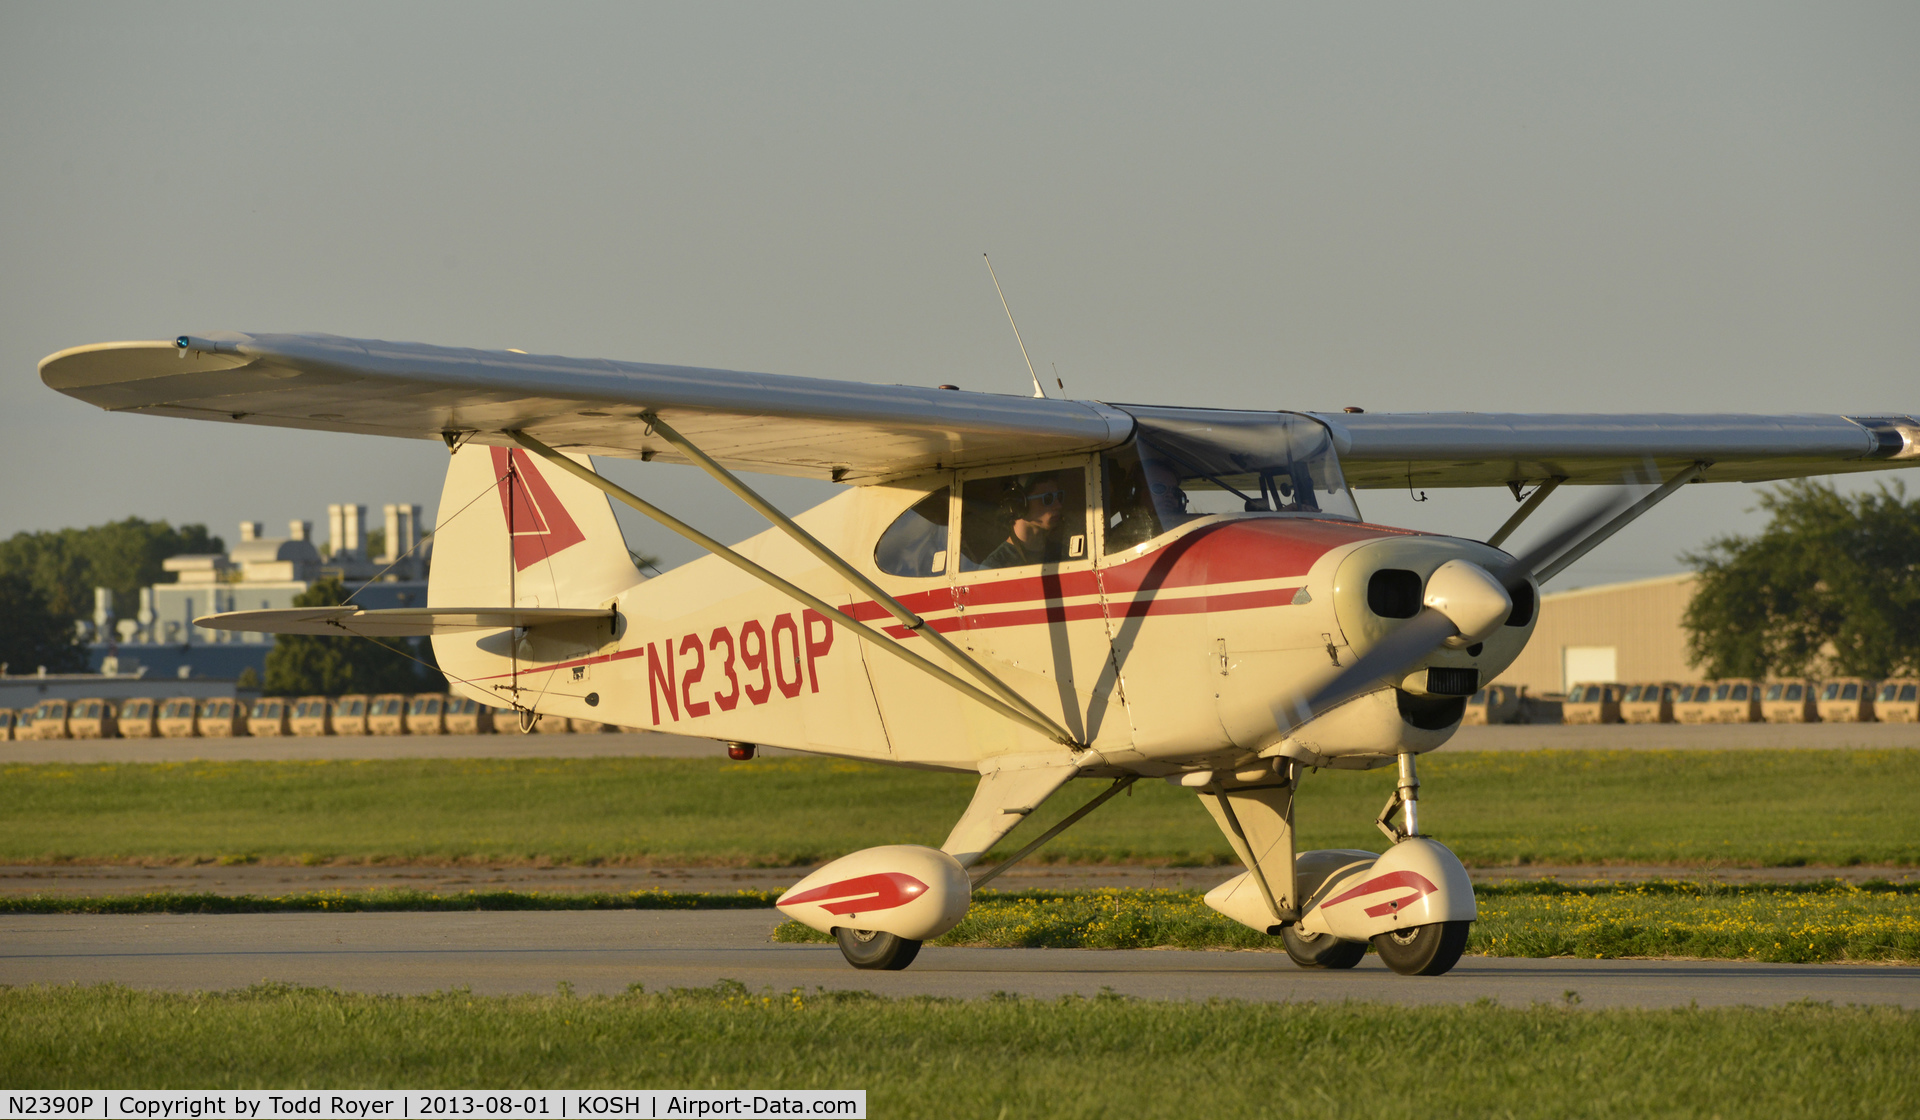 N2390P, 1955 Piper PA-22-150 Tri-Pacer C/N 22-2781, Airventure 2013